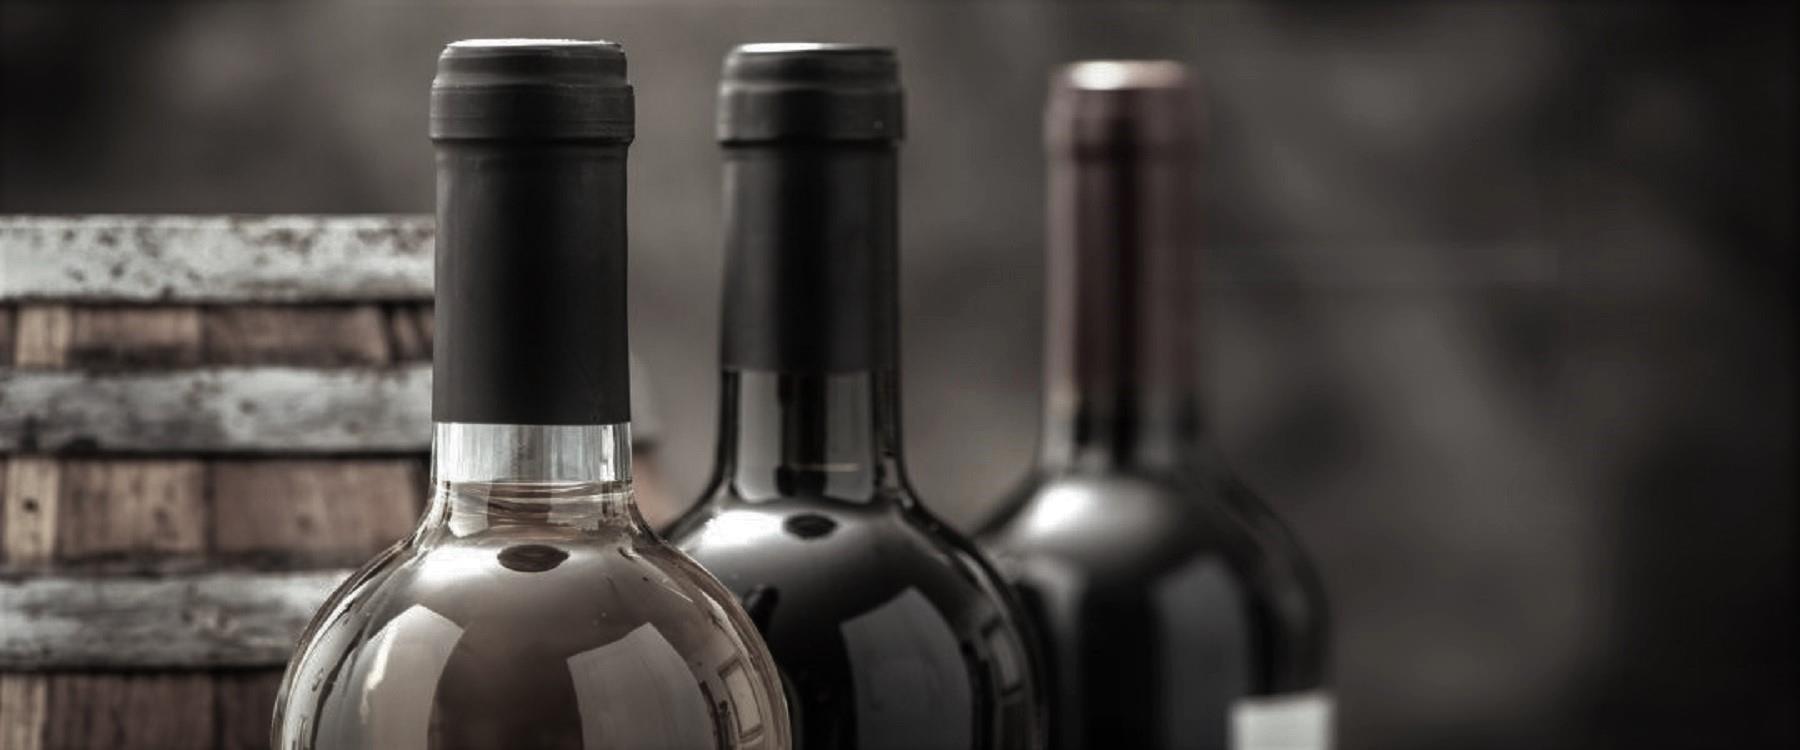 struguri și vinuri in sticla si la butoi